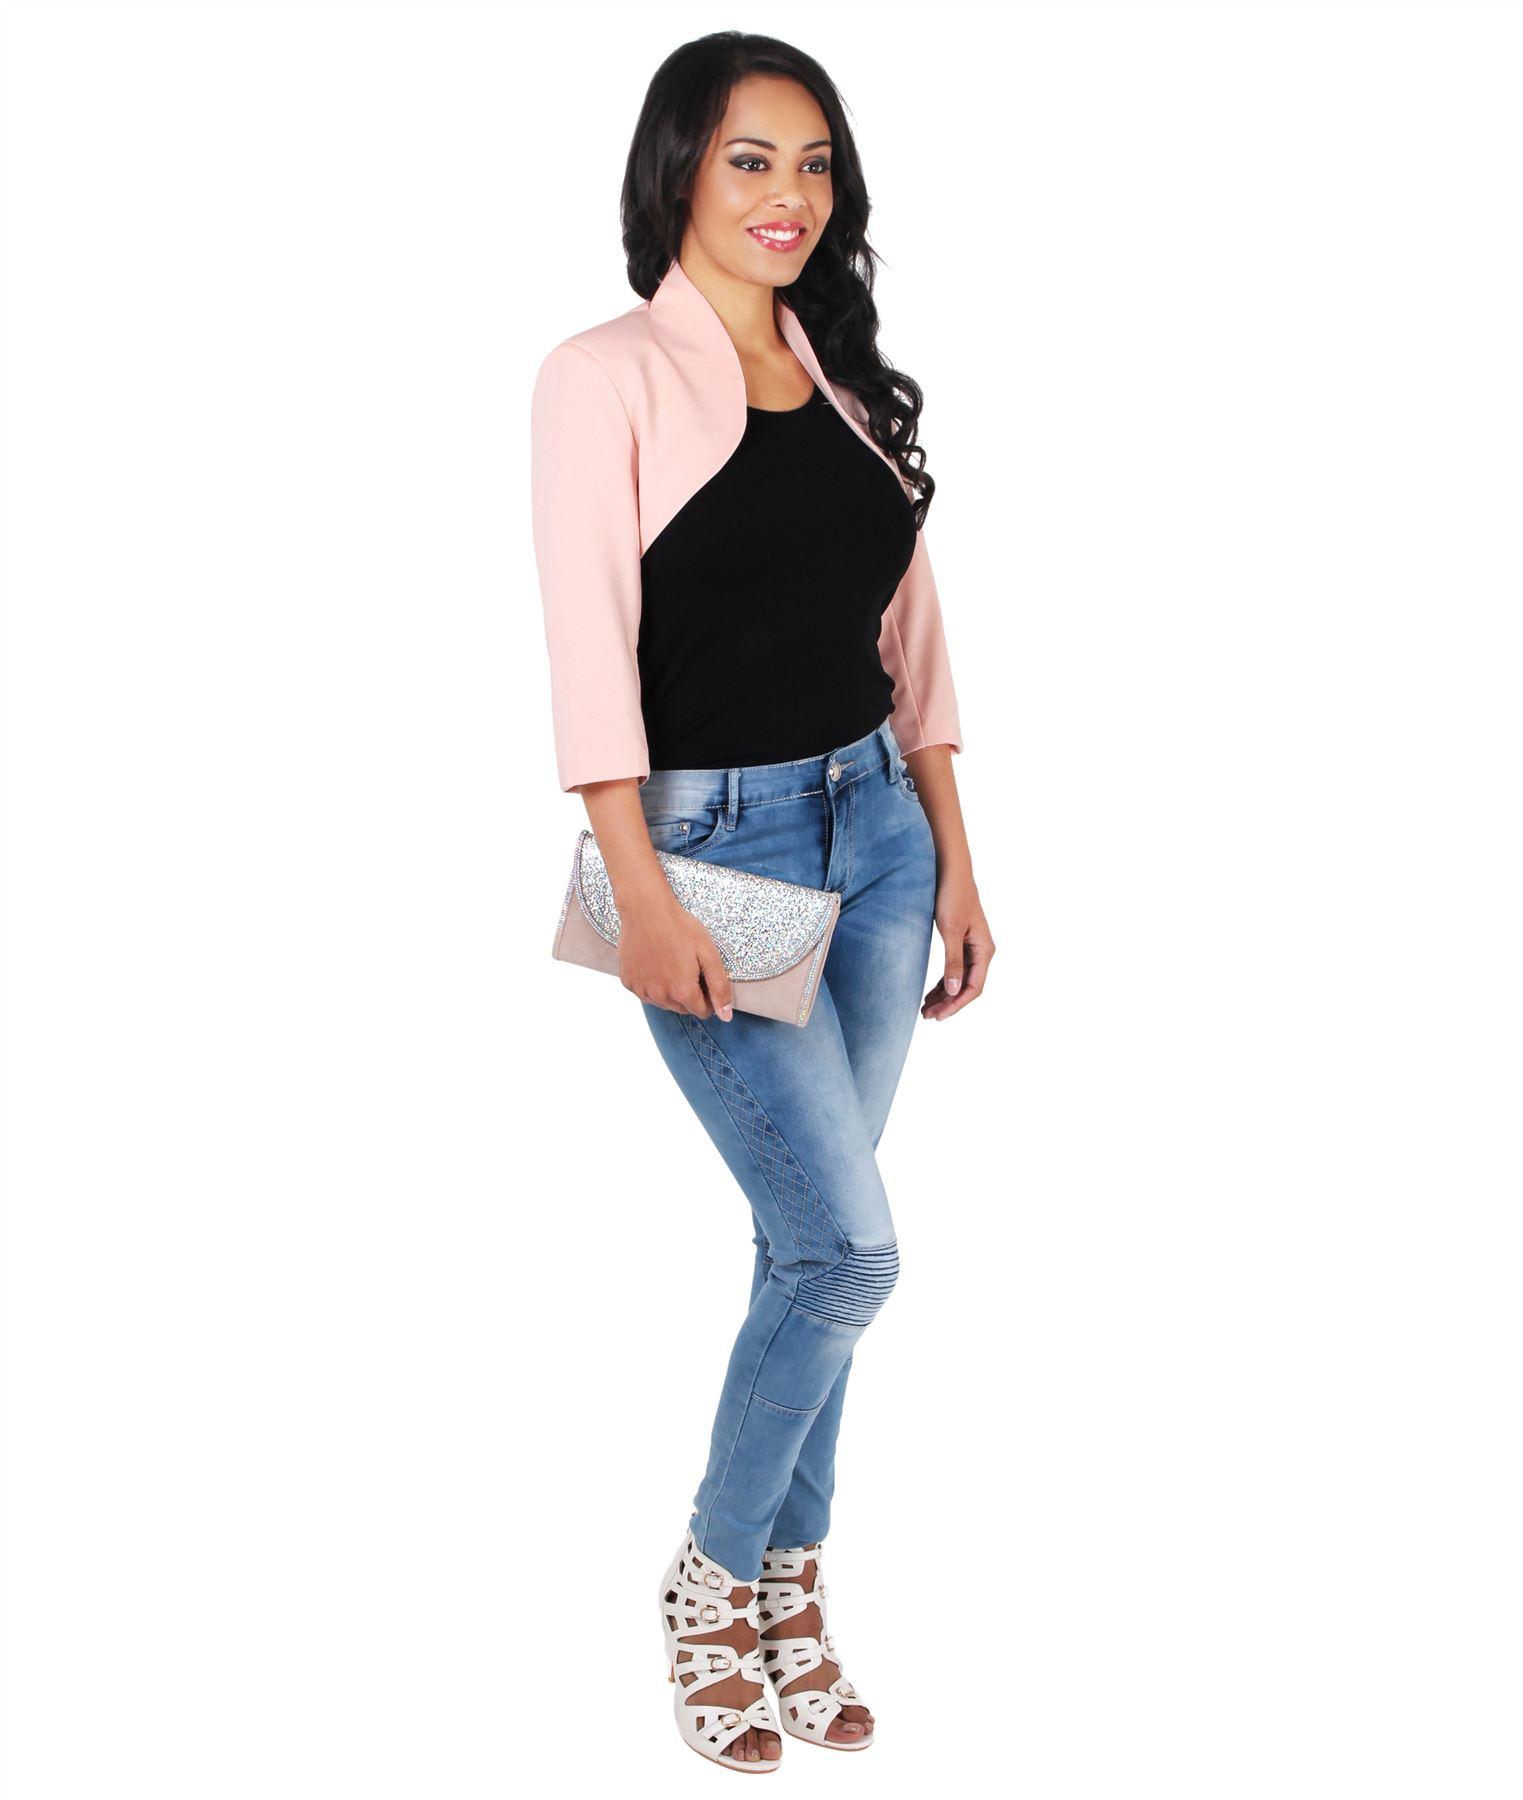 Womens-Tailored-Bolero-Shrug-Cropped-Top-Short-Sleeve-Party-Blazer-Jacket-Coat thumbnail 9